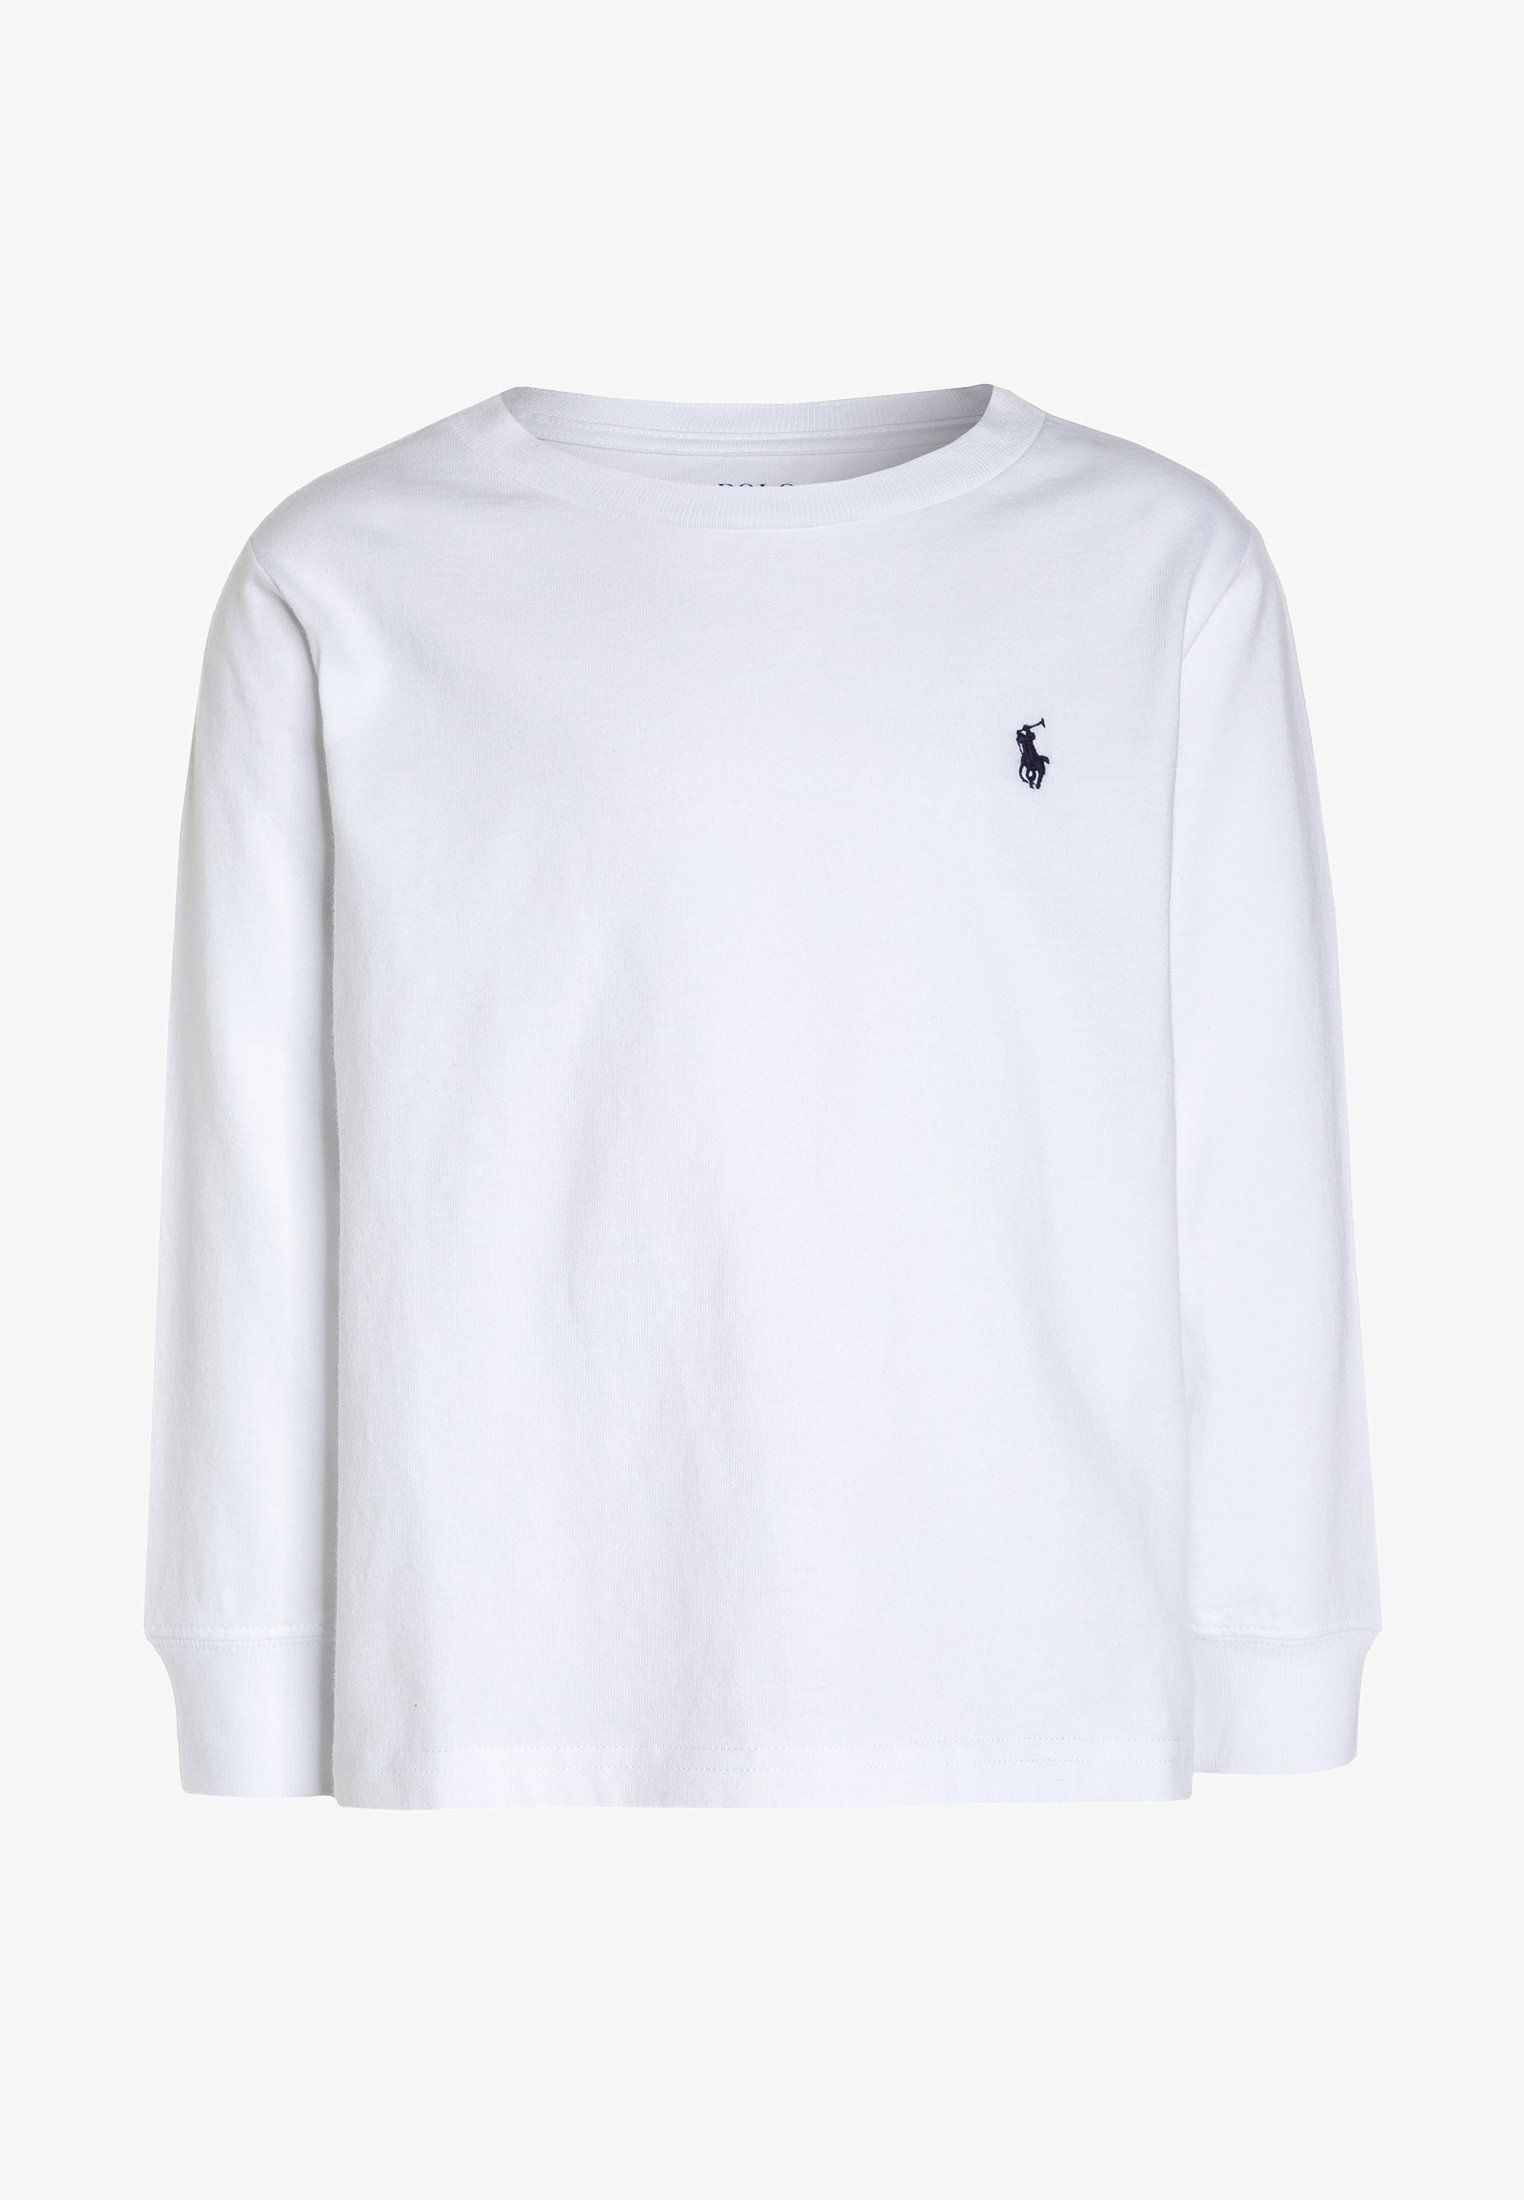 Polo Ralph Lauren BASIC - T-shirt à manches longues - white - ZALANDO. b108fdf98cab